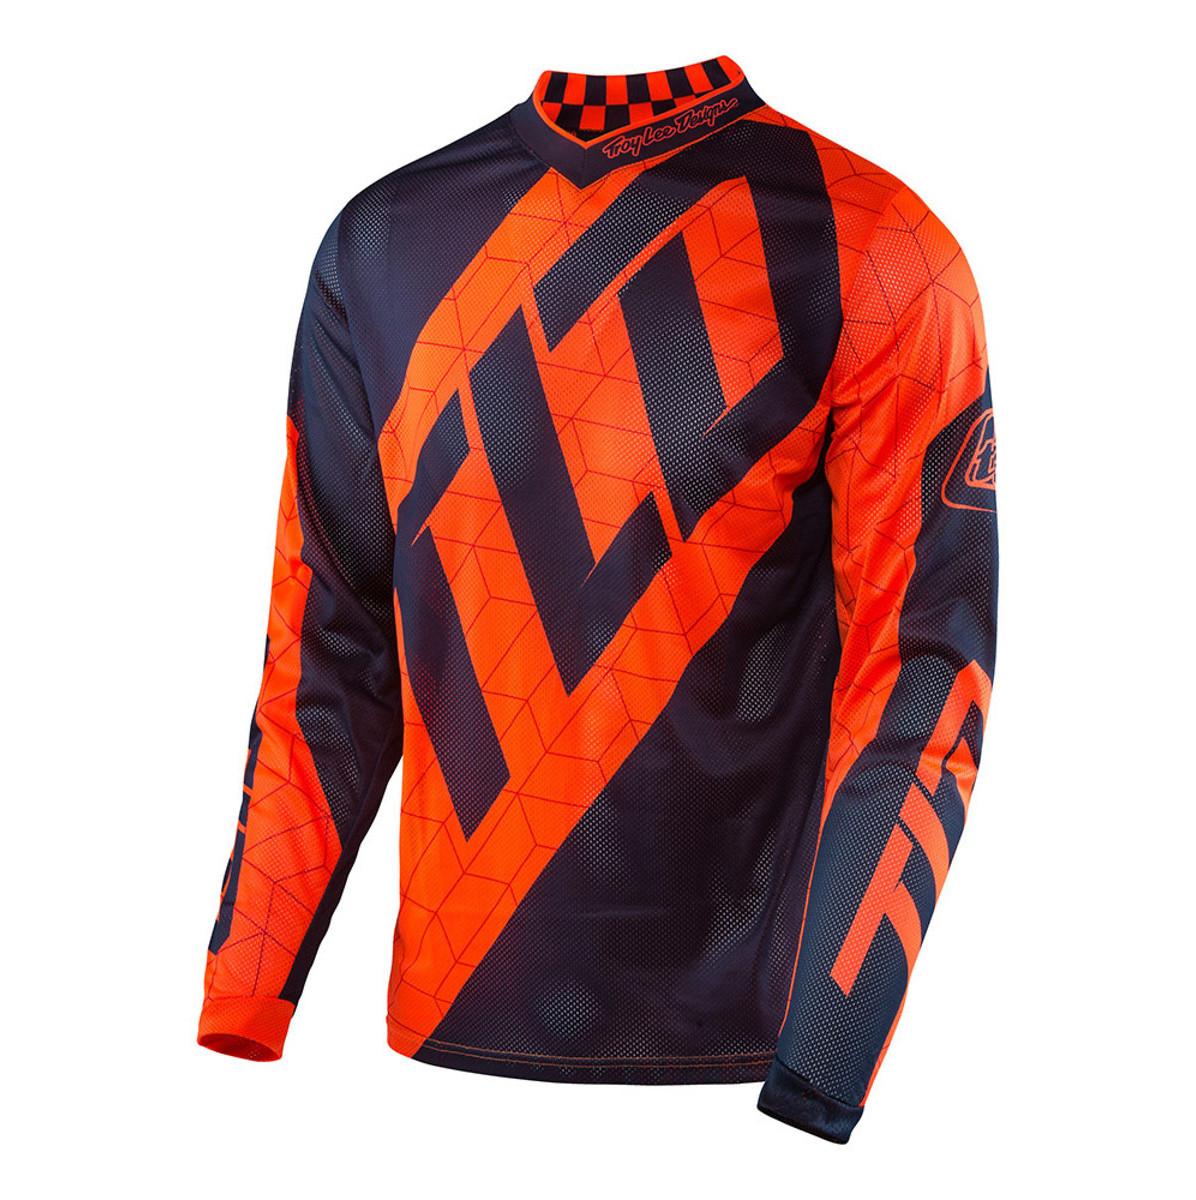 Troy Lee Designs GP Air Jersey - Reviews, Comparisons, Specs - Mountain  Bike Riding Jerseys - Vital MTB